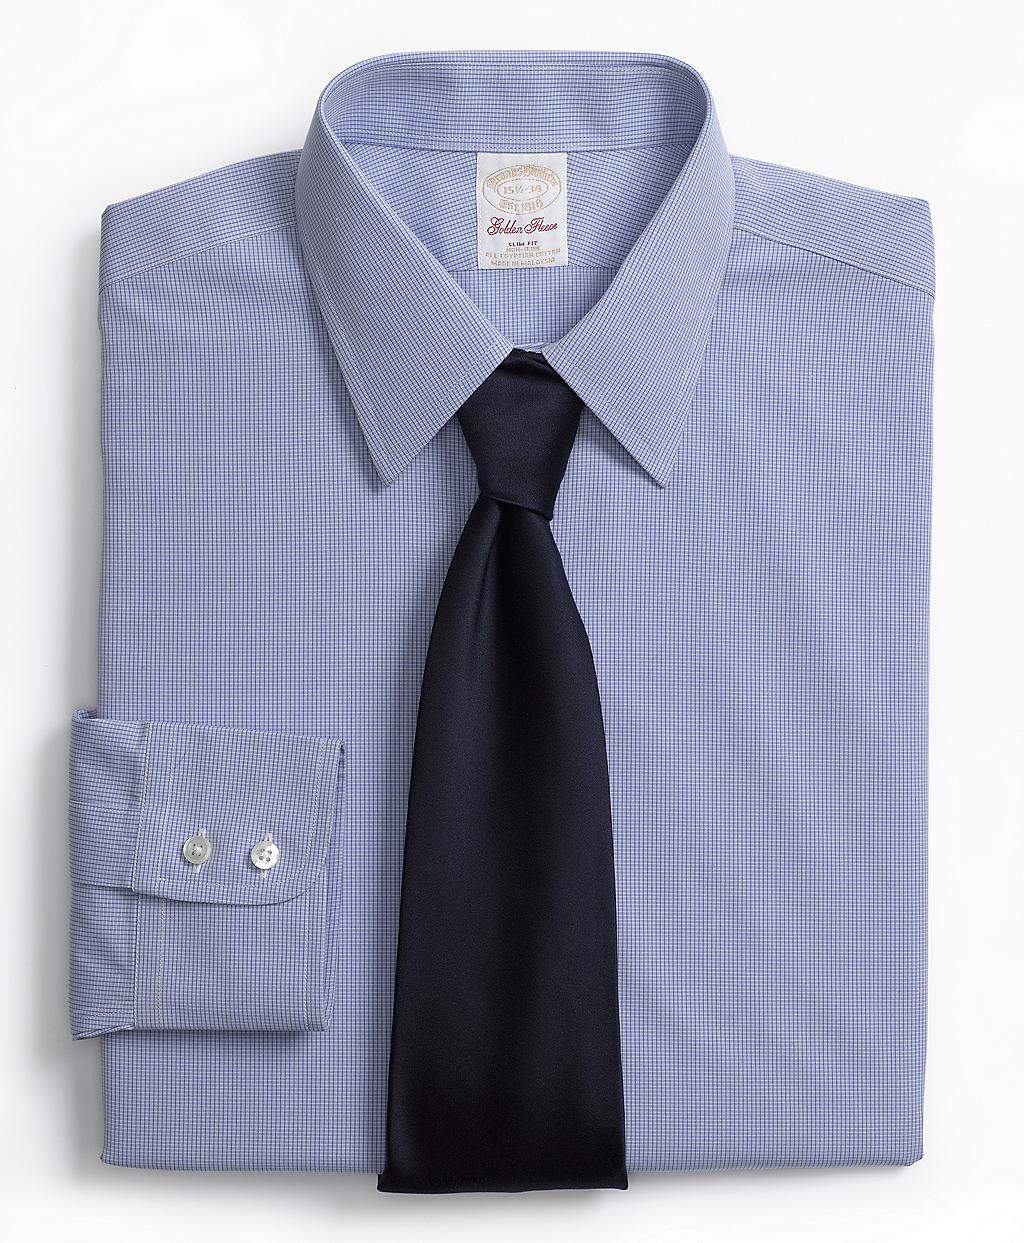 Brooks brothers golden fleece non iron regent fit mini for Brooks brothers dress shirt fit